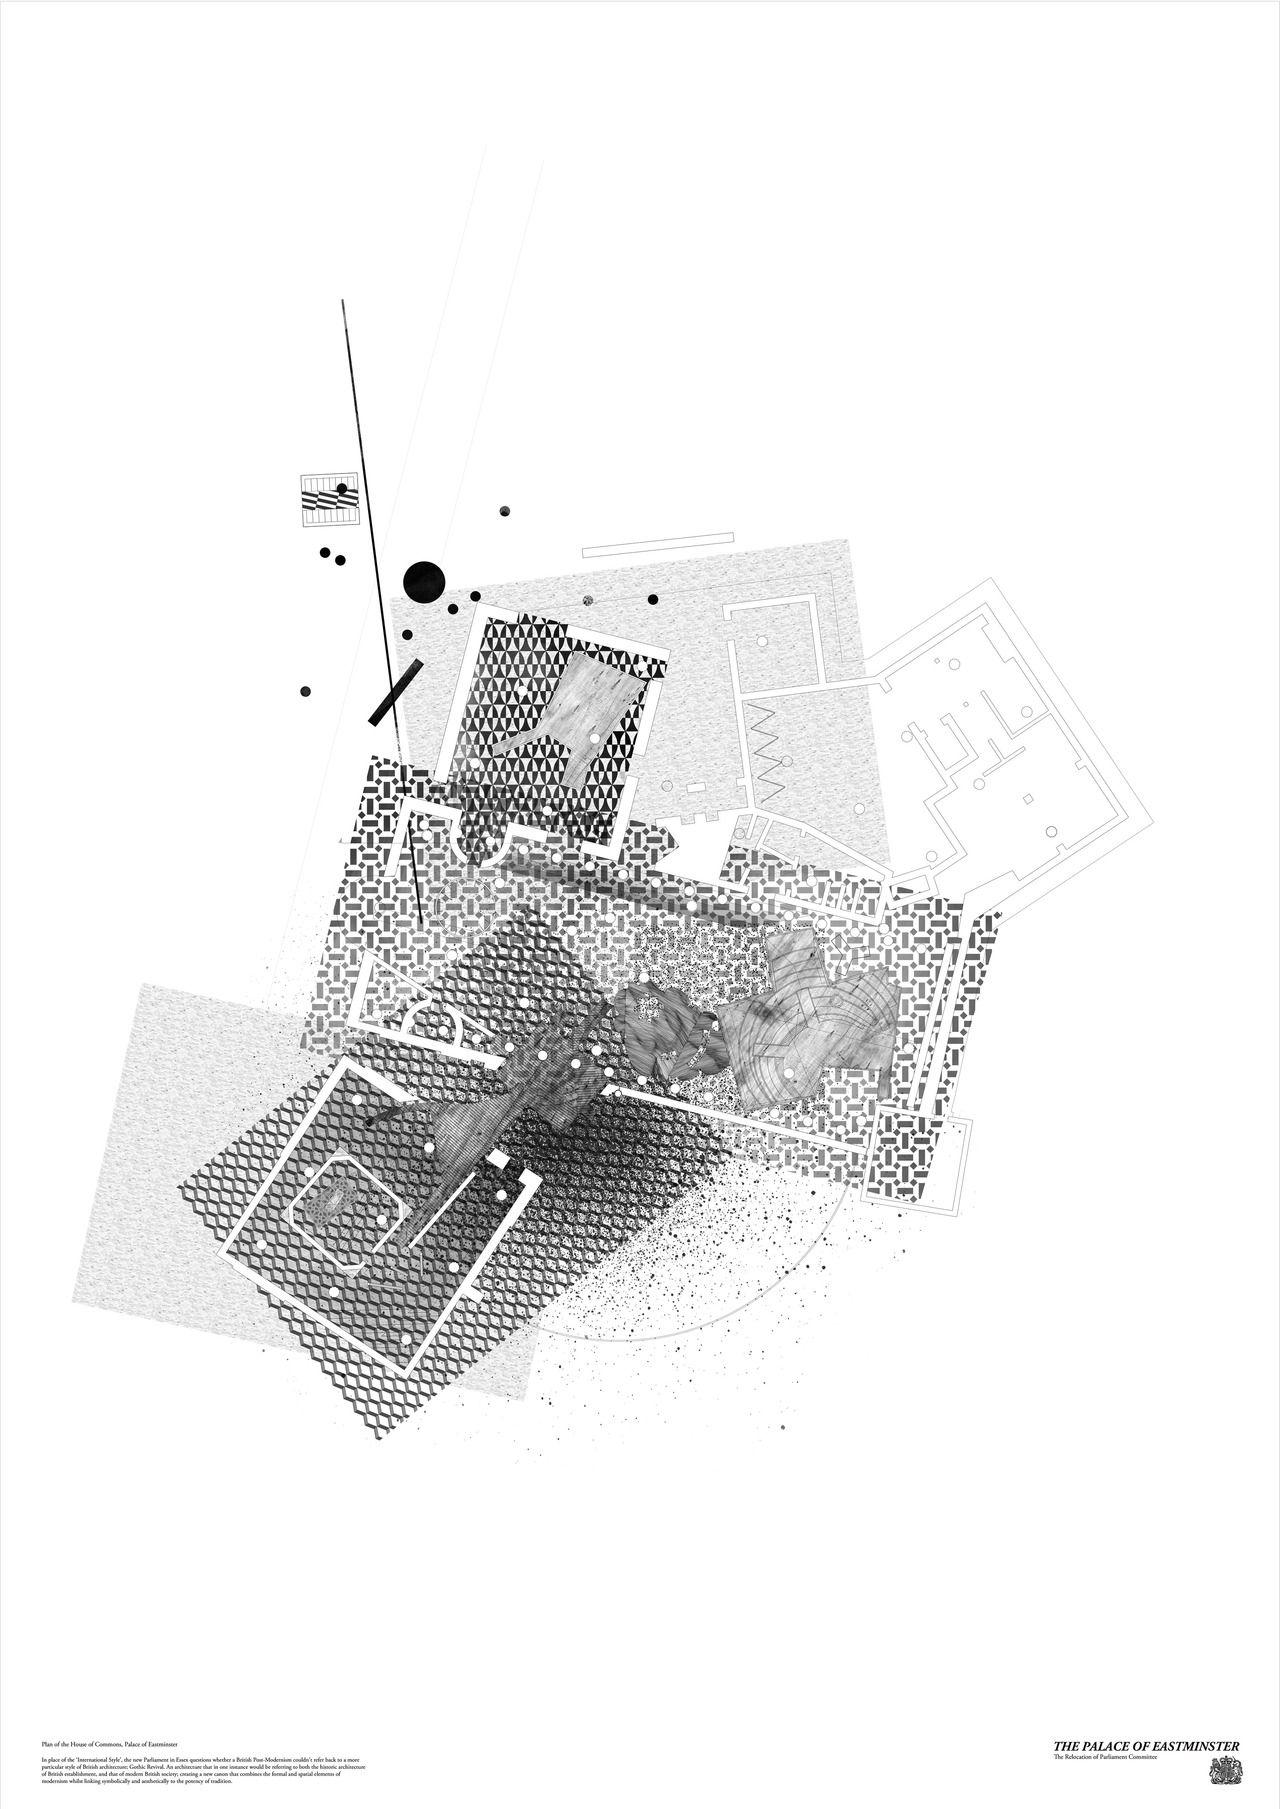 tumblr_ml97hxLX991rab81uo1_r1_1280 | drawings+diagrams | Pinterest ...